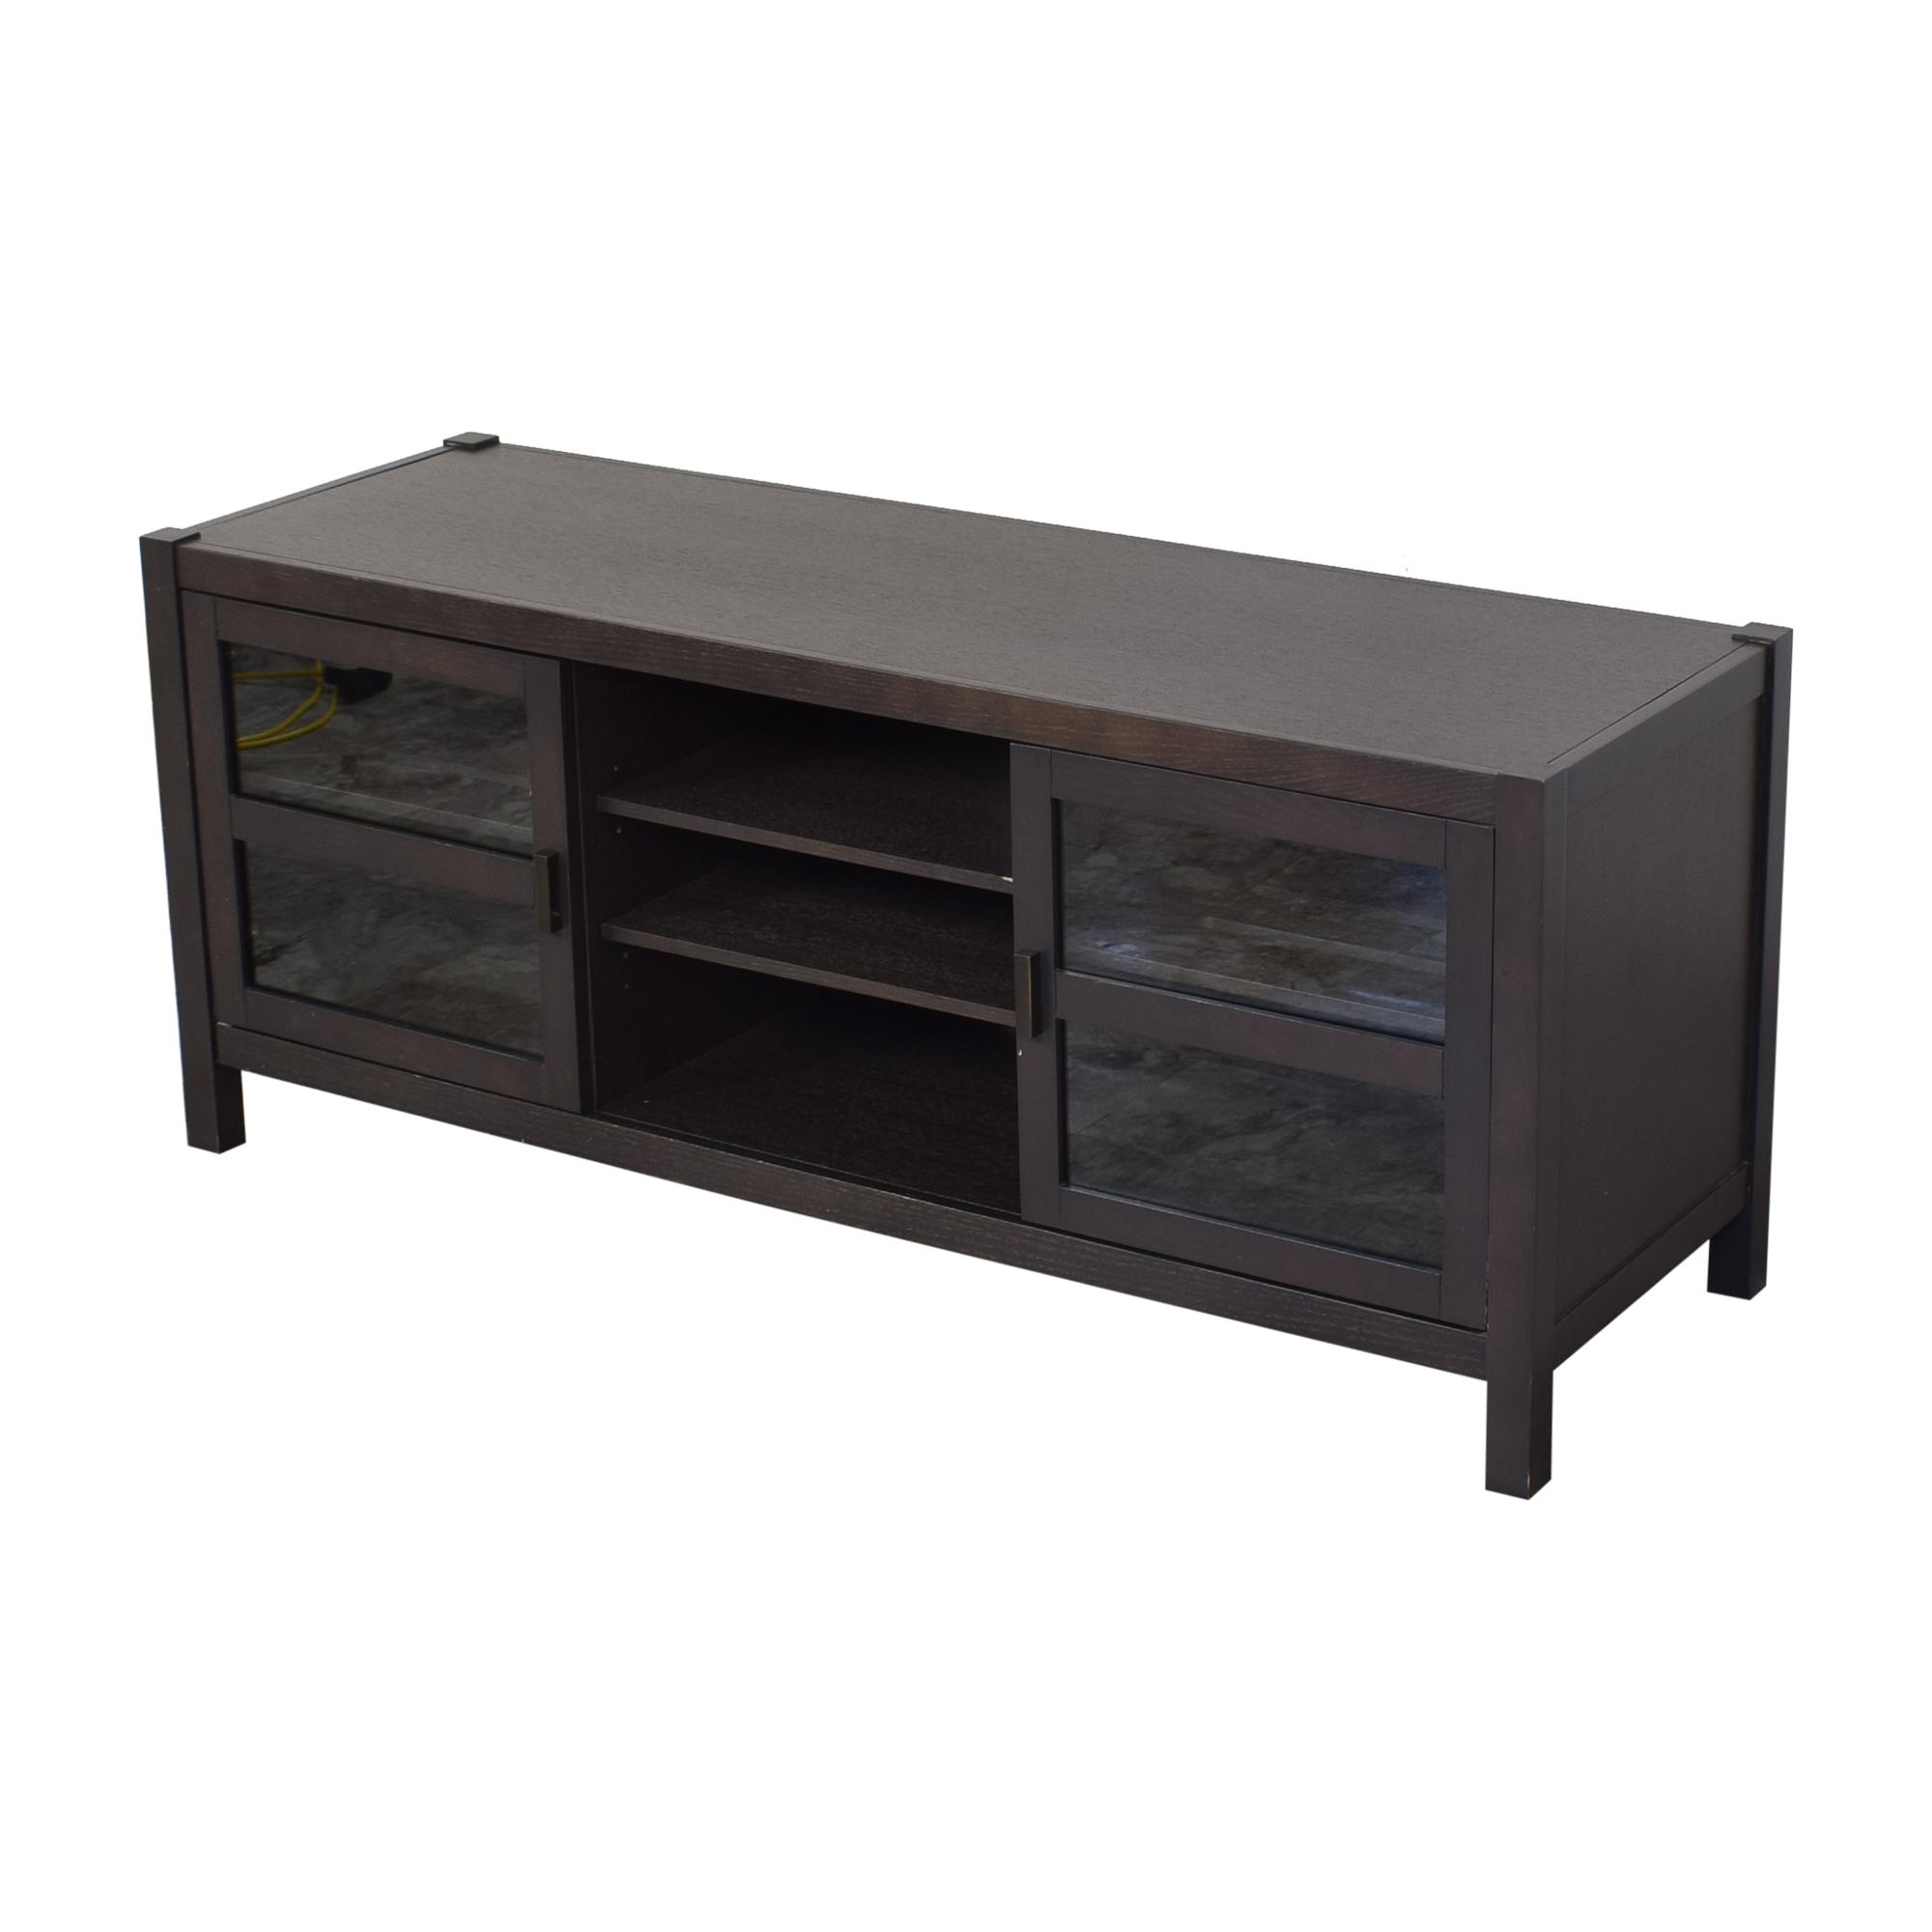 shop Crate & Barrel Crate & Barrel Modern Media Console online